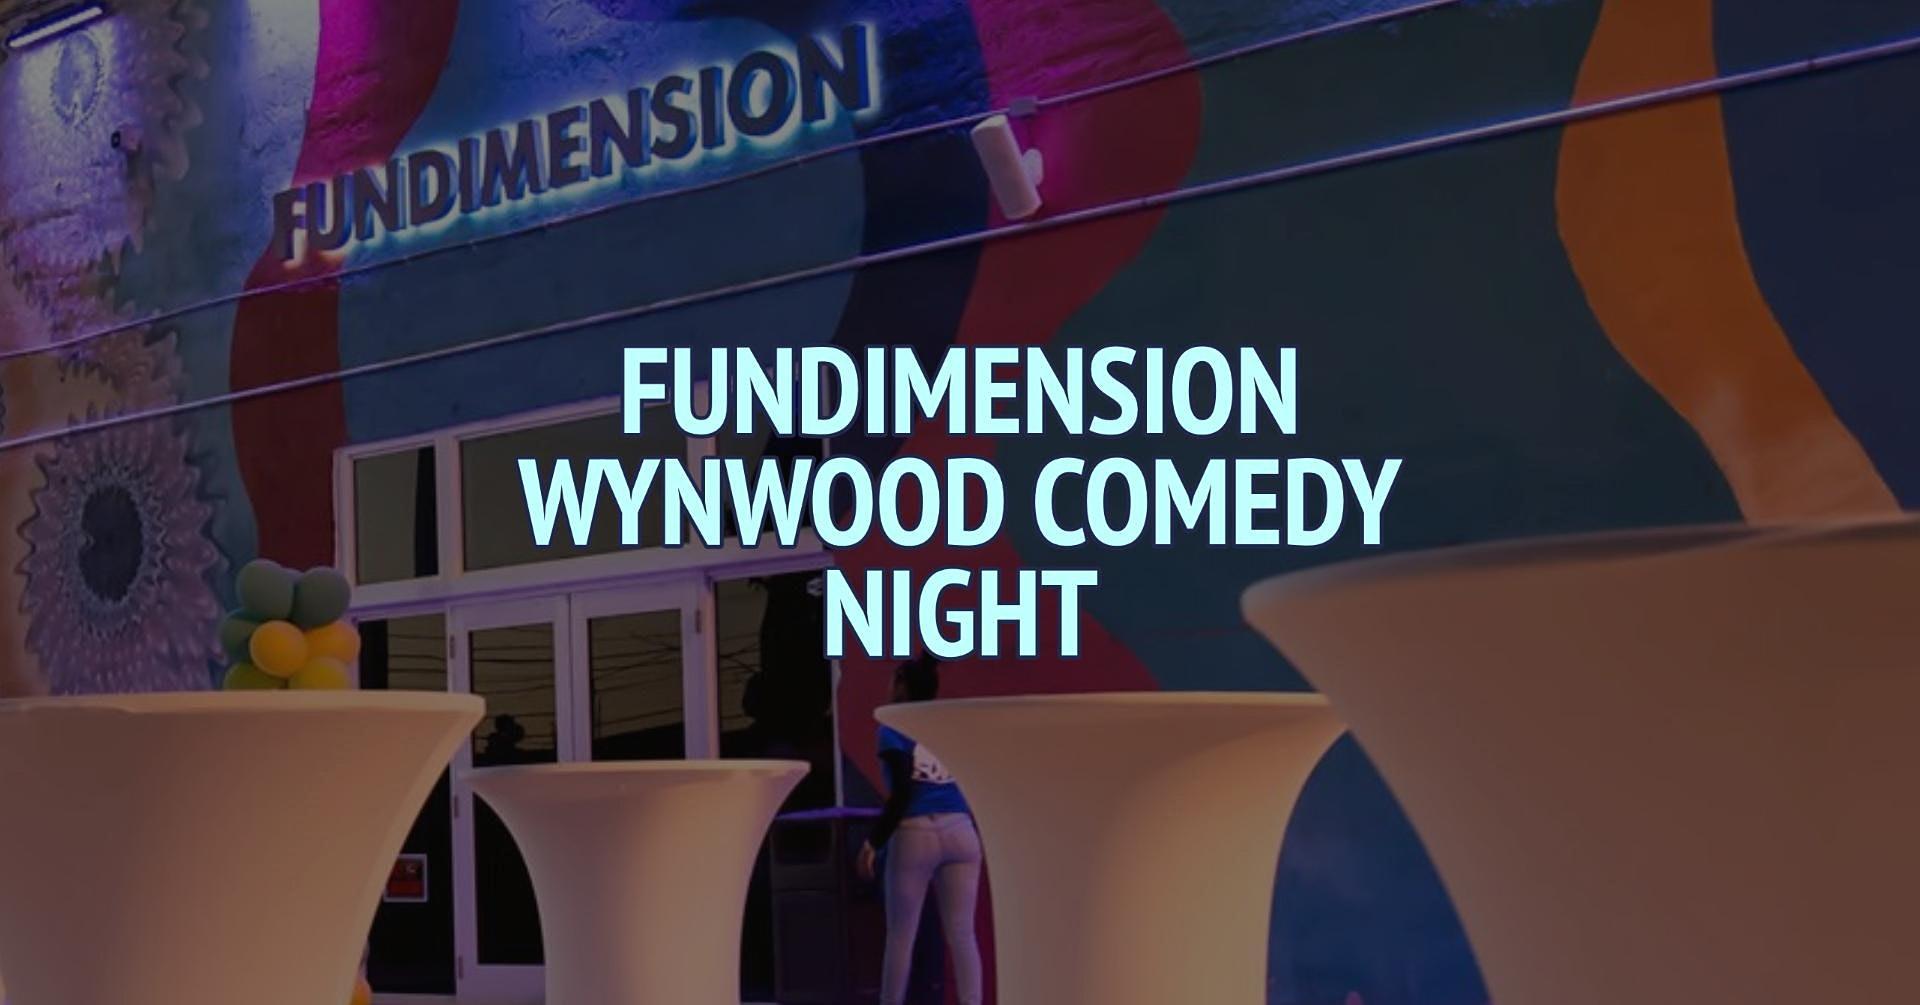 Fundimension comdy night